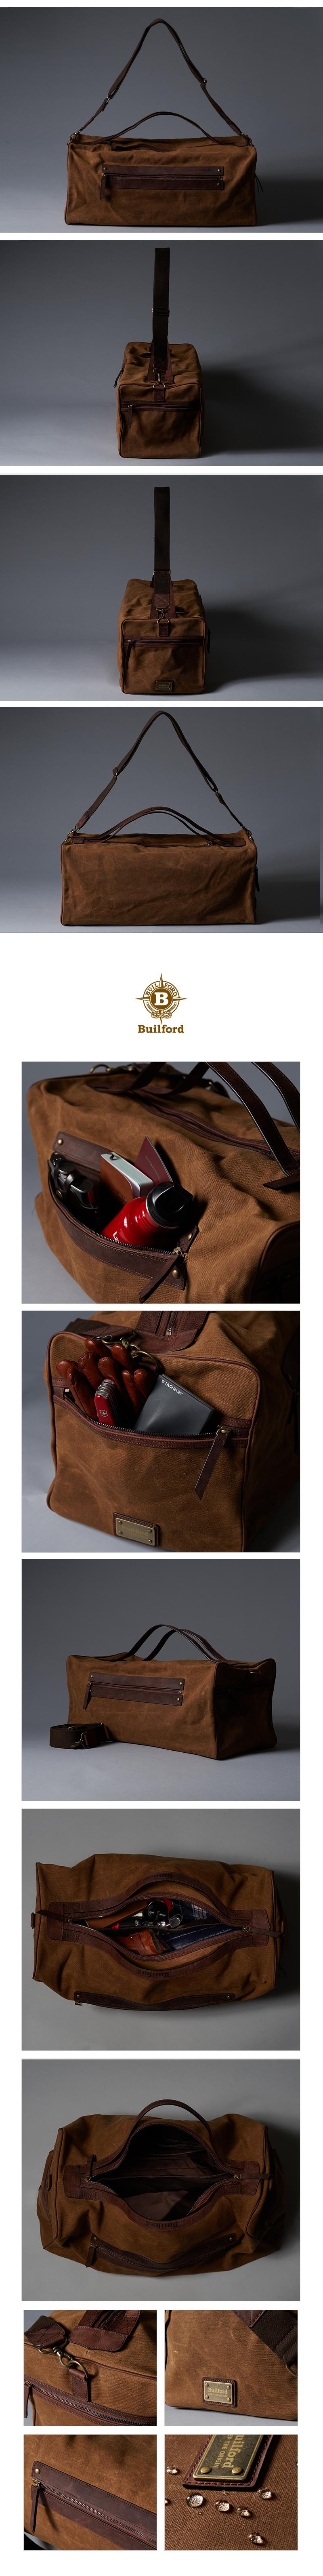 Travel Duffle bag_2